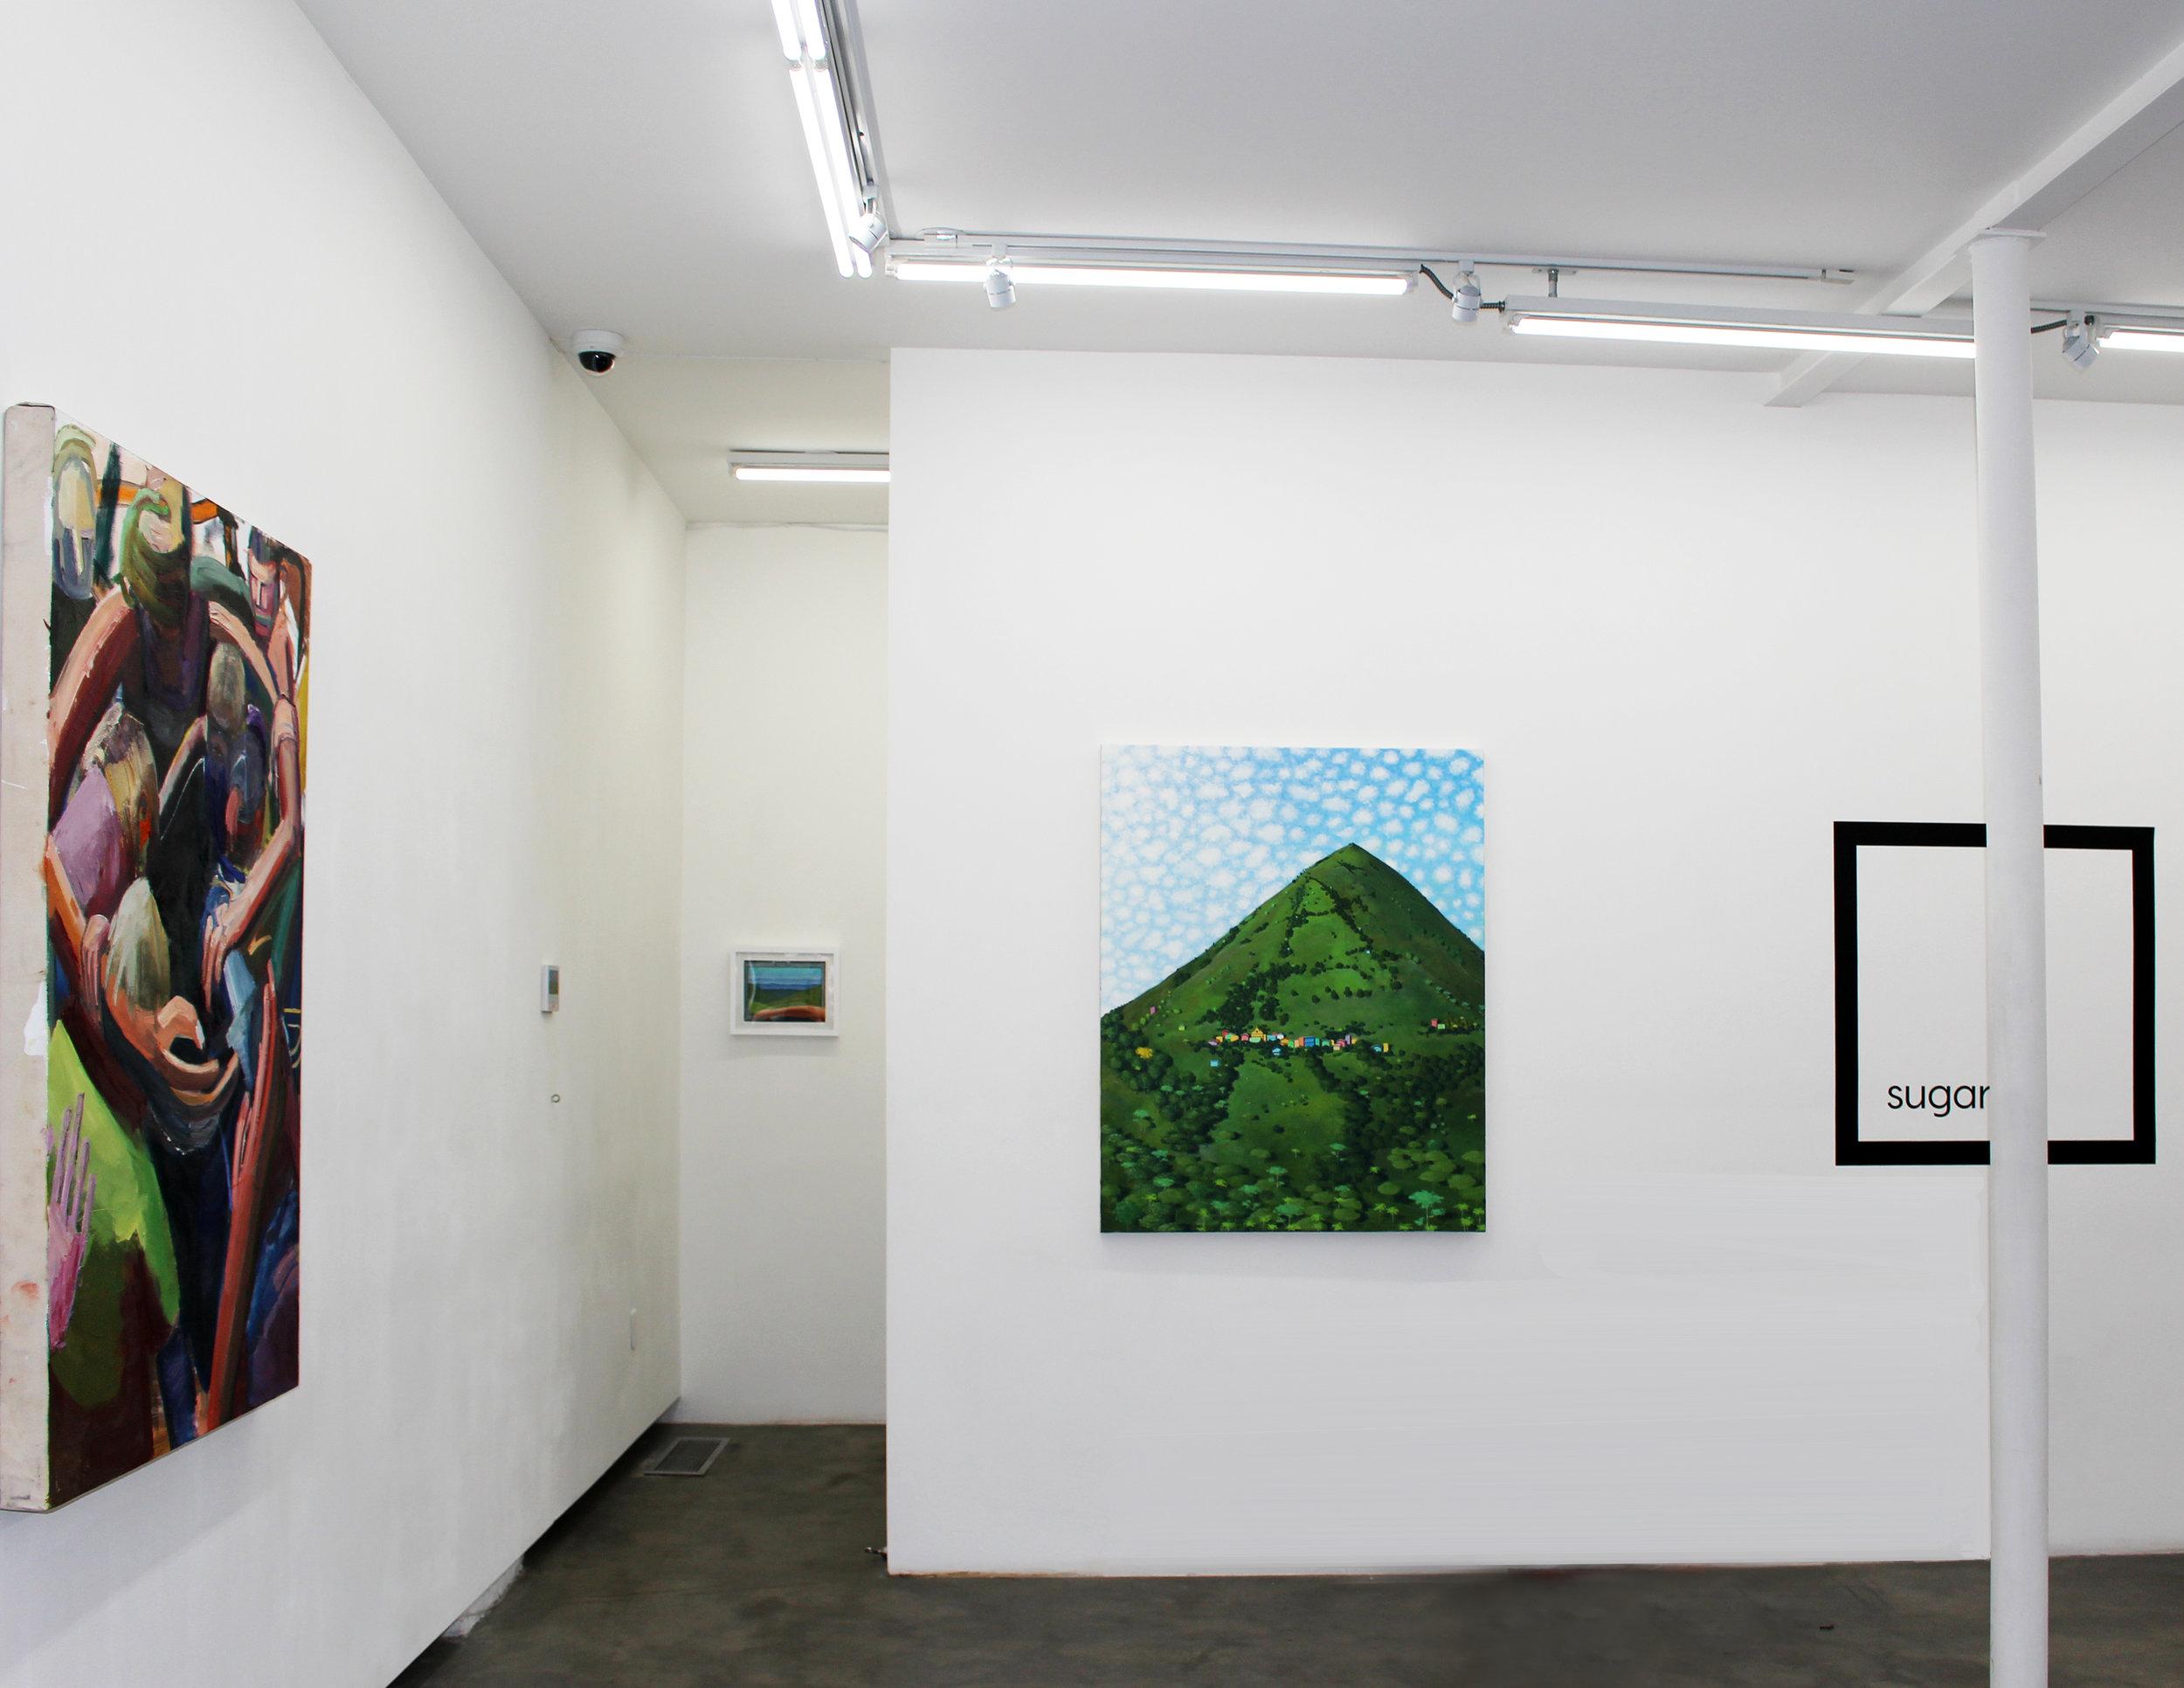 install shot of Jacob Patrick Brooks's and Esteban Ocampo Giraldo's paintings